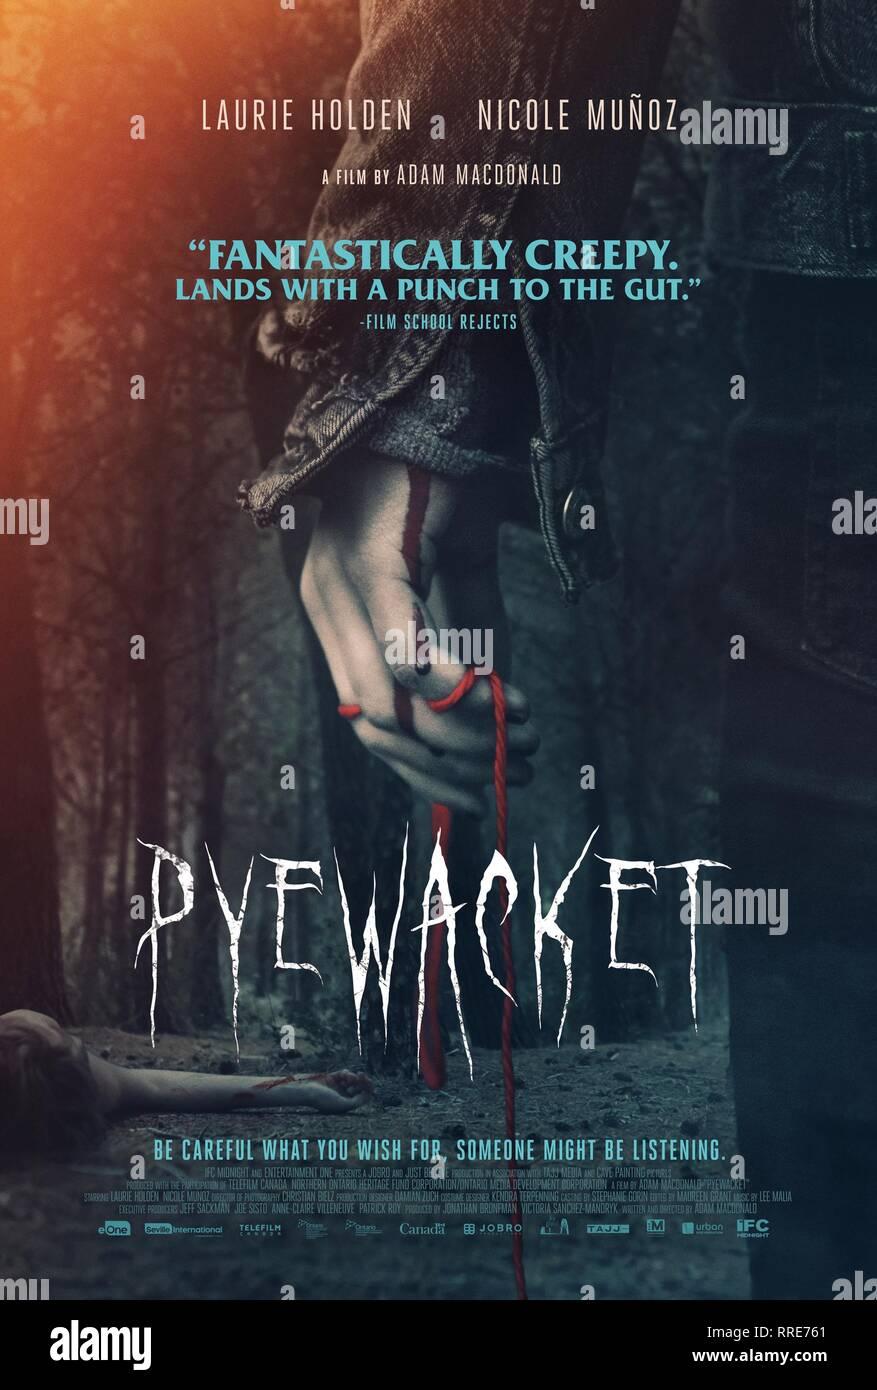 PYEWACKET, MOVIE POSTER, 2017 - Stock Image